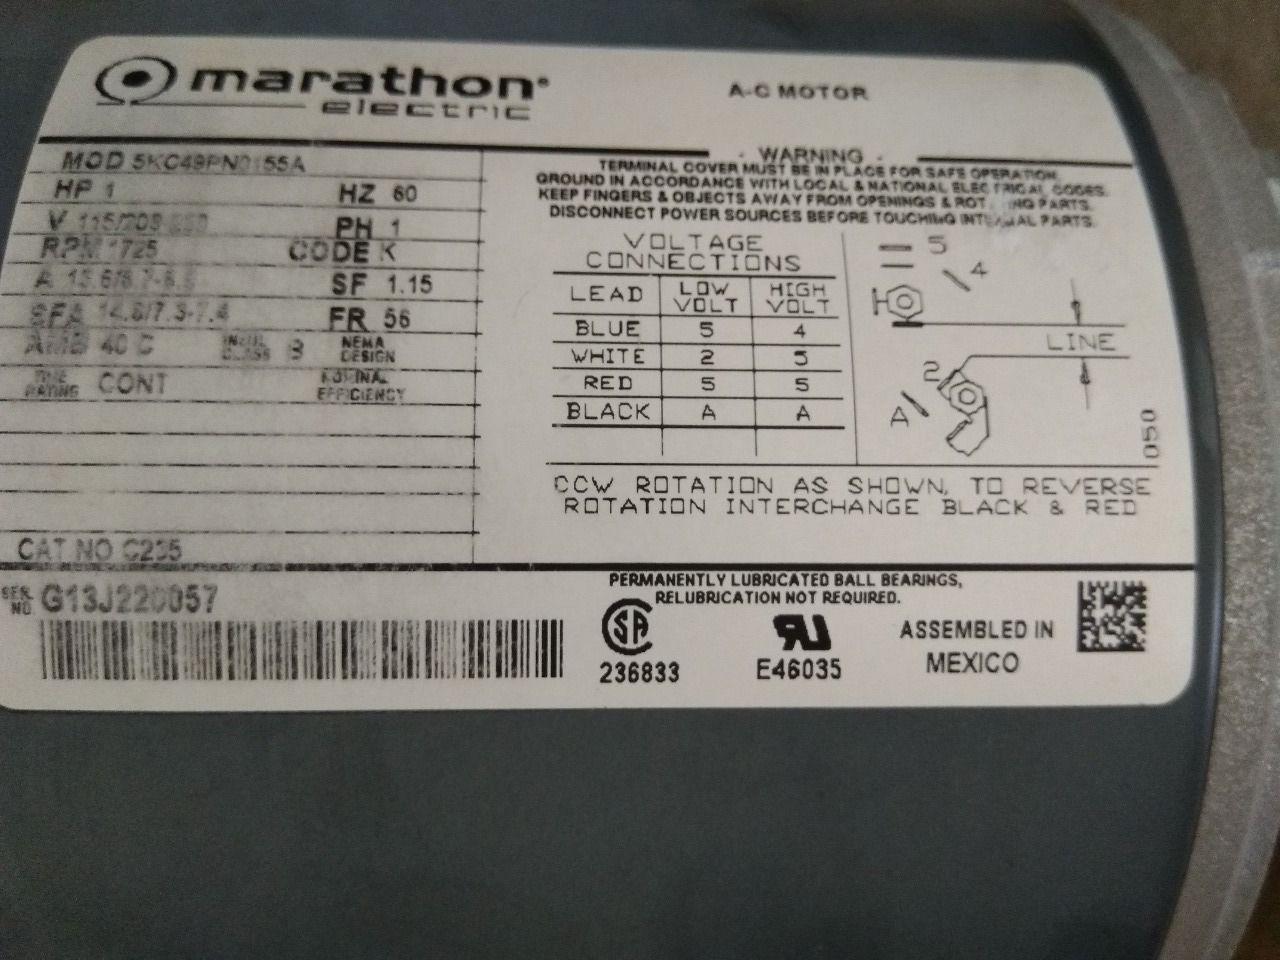 Marathon Electric C235    5kc49pn0155 Motor